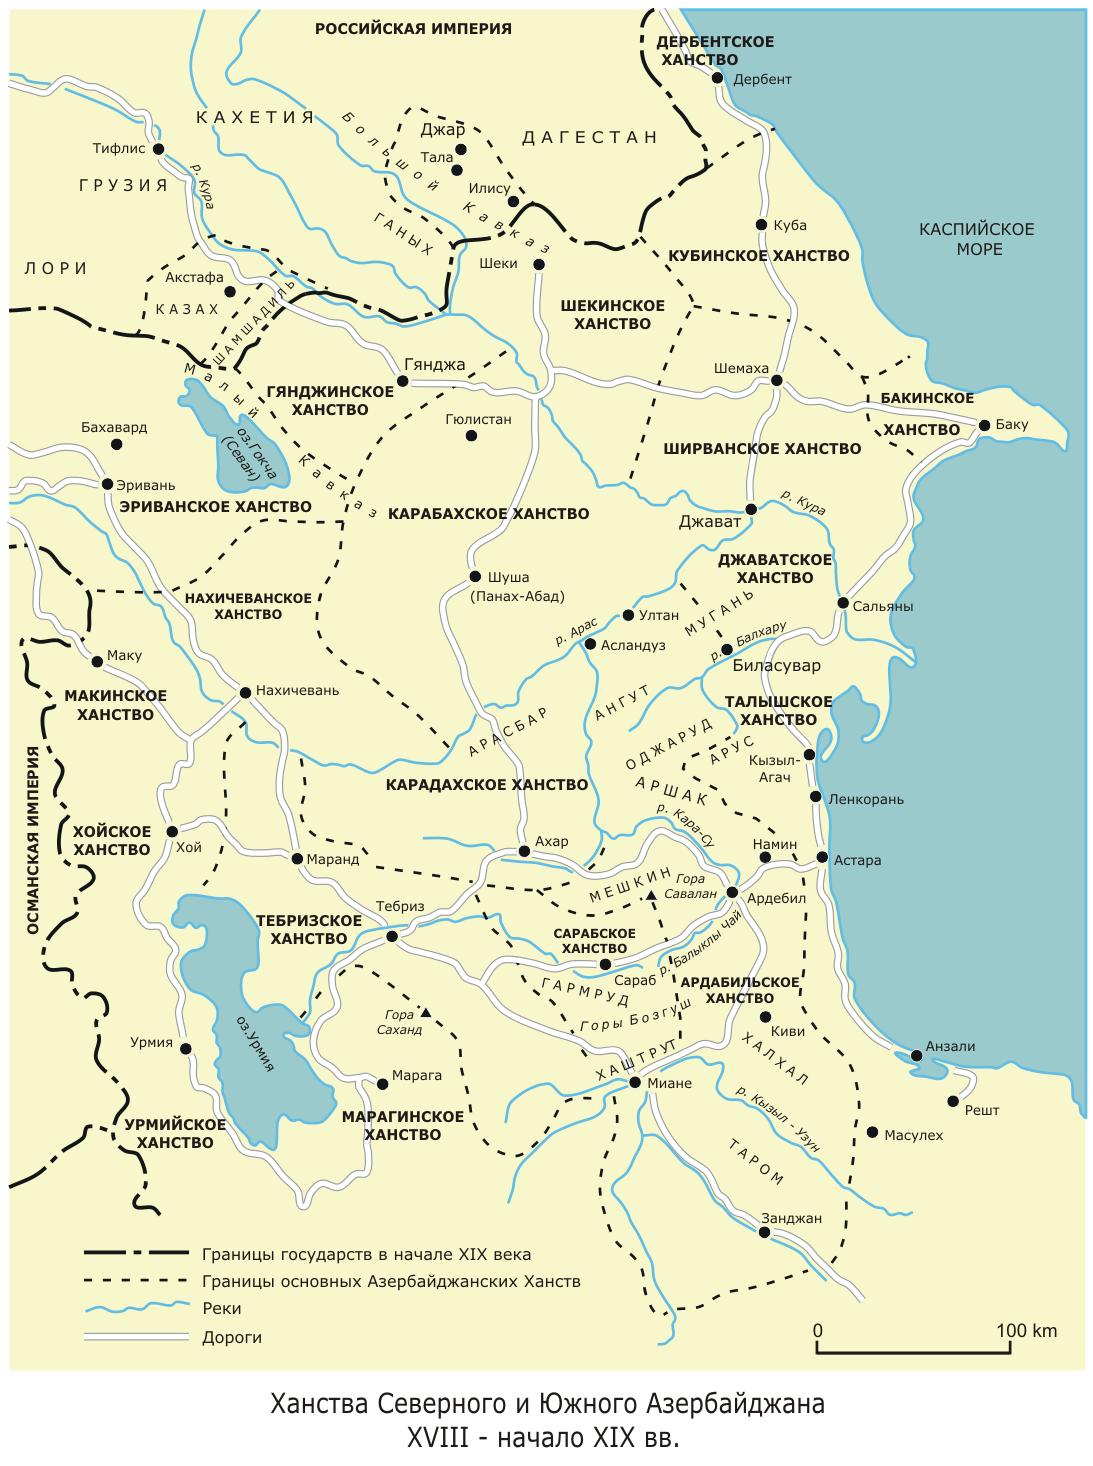 http://dic.academic.ru/pictures/wiki/files/65/Azerbaijan_khanates_all_XVIII-XIX.png